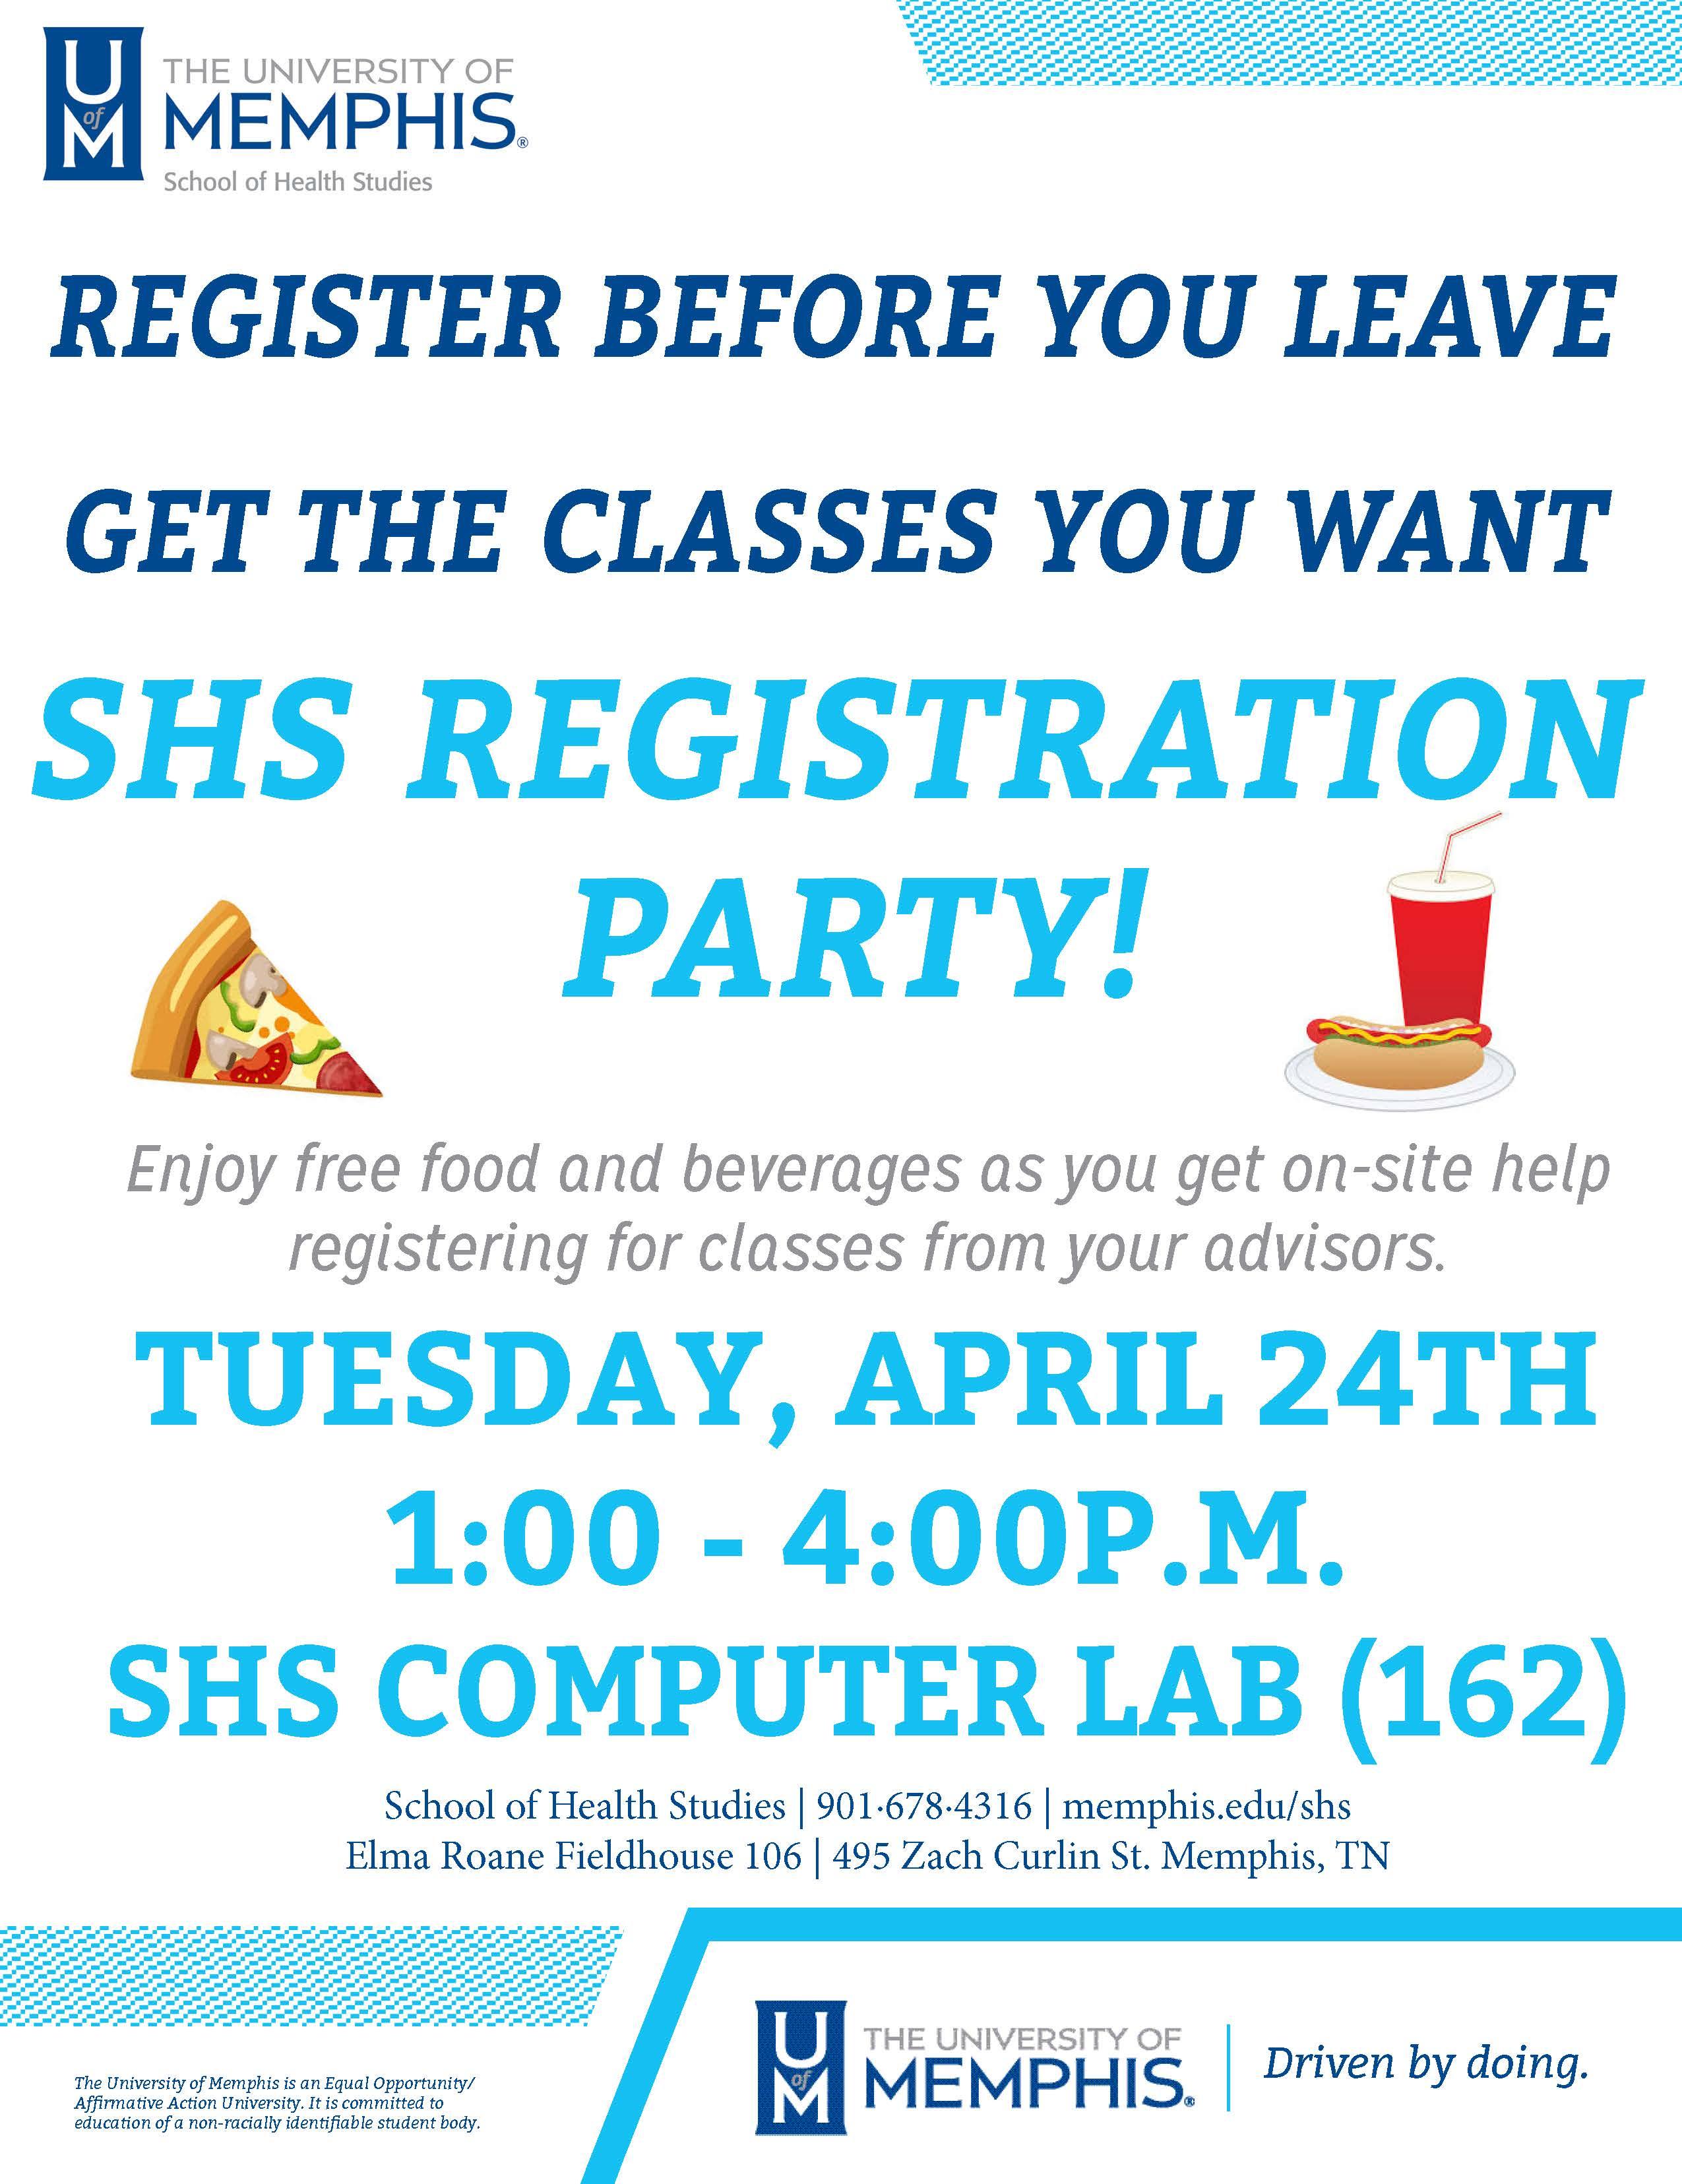 Registration Party Flyer